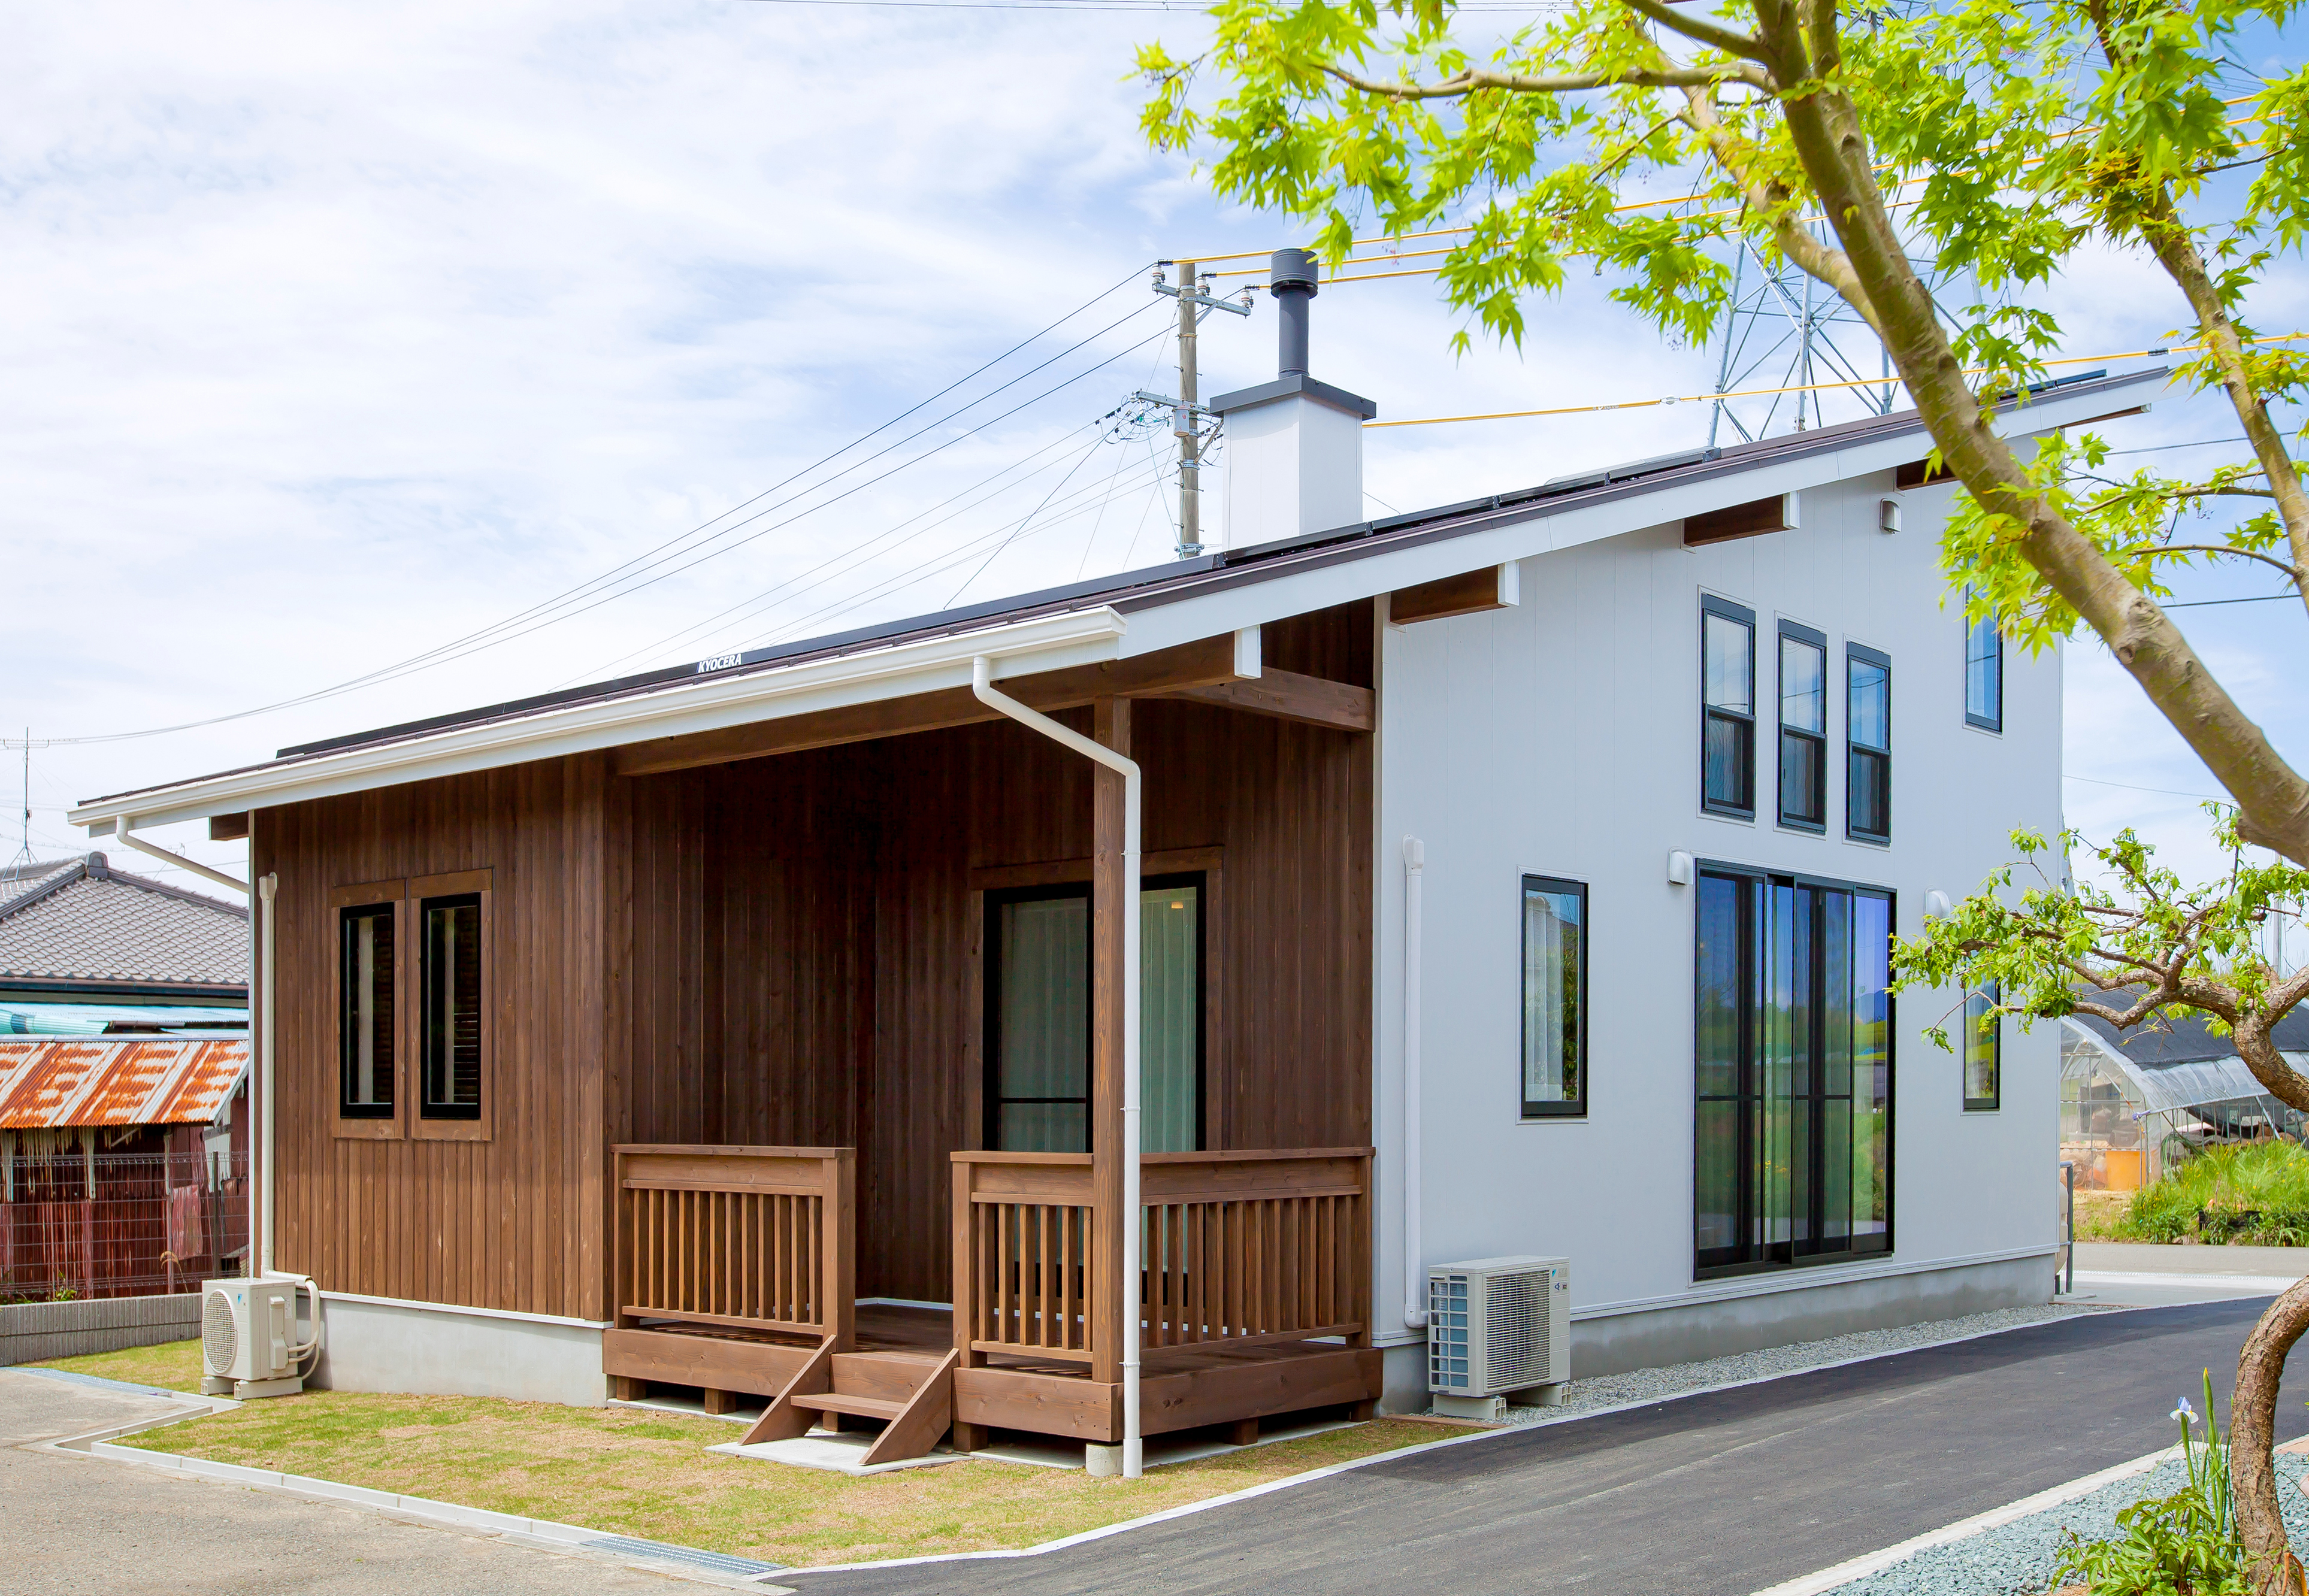 Y邸は平屋+αの1.5階建て。南面のウッドデッキはアウターリビングとしてマルチに使える。日本家屋の特徴でもある長い庇は、太陽の位置が高い夏は日光を遮り、太陽の位置が低い冬は部屋の奥までほどよく日光を届けるので、エアコンに頼らず快適に暮らせる